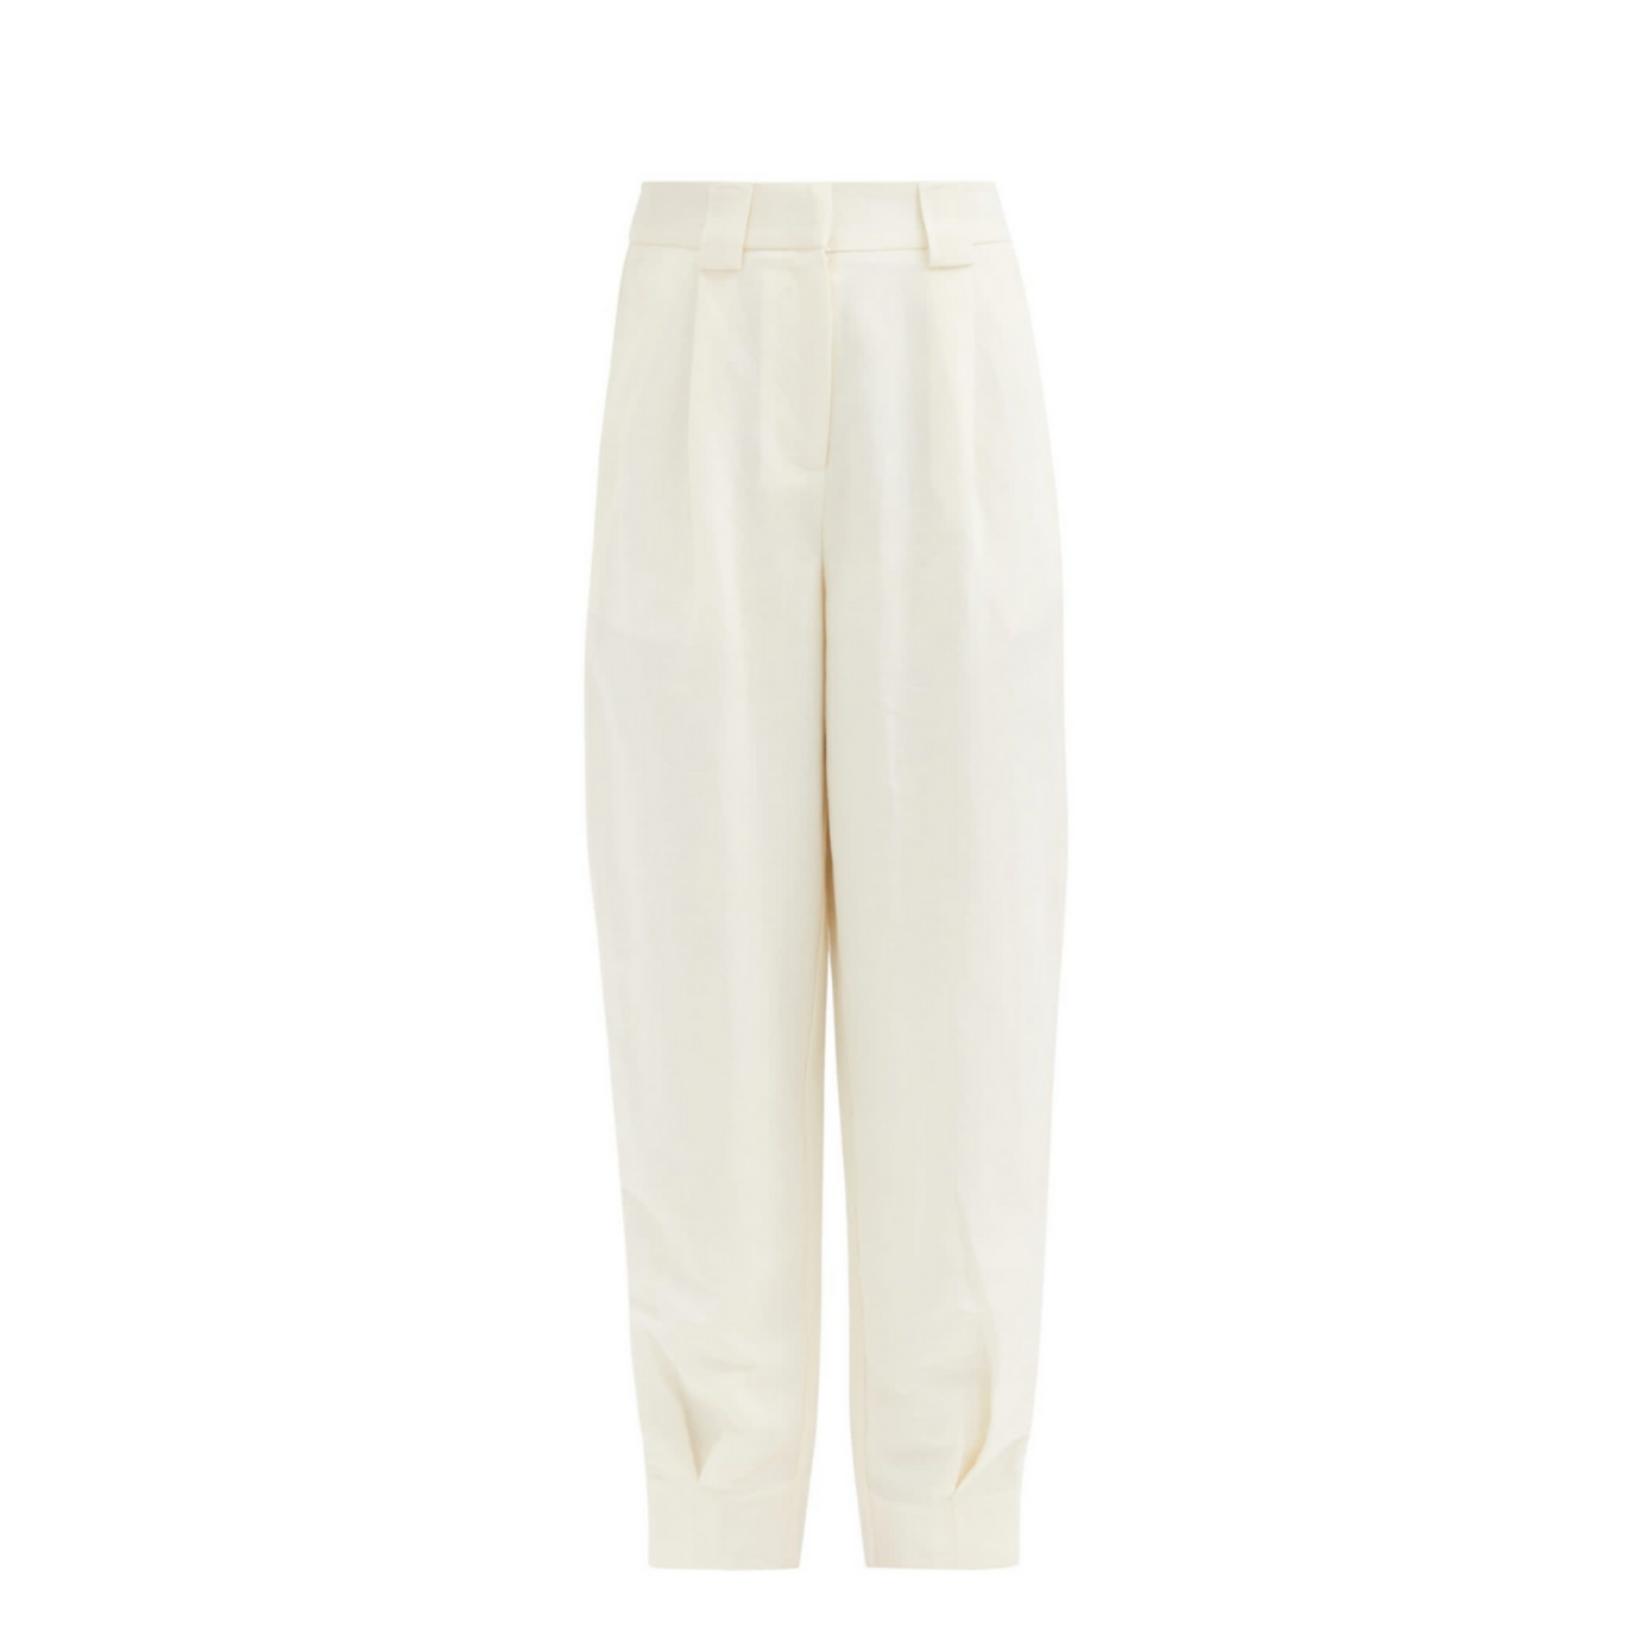 Arjé Rox Tailored Linen Trousers